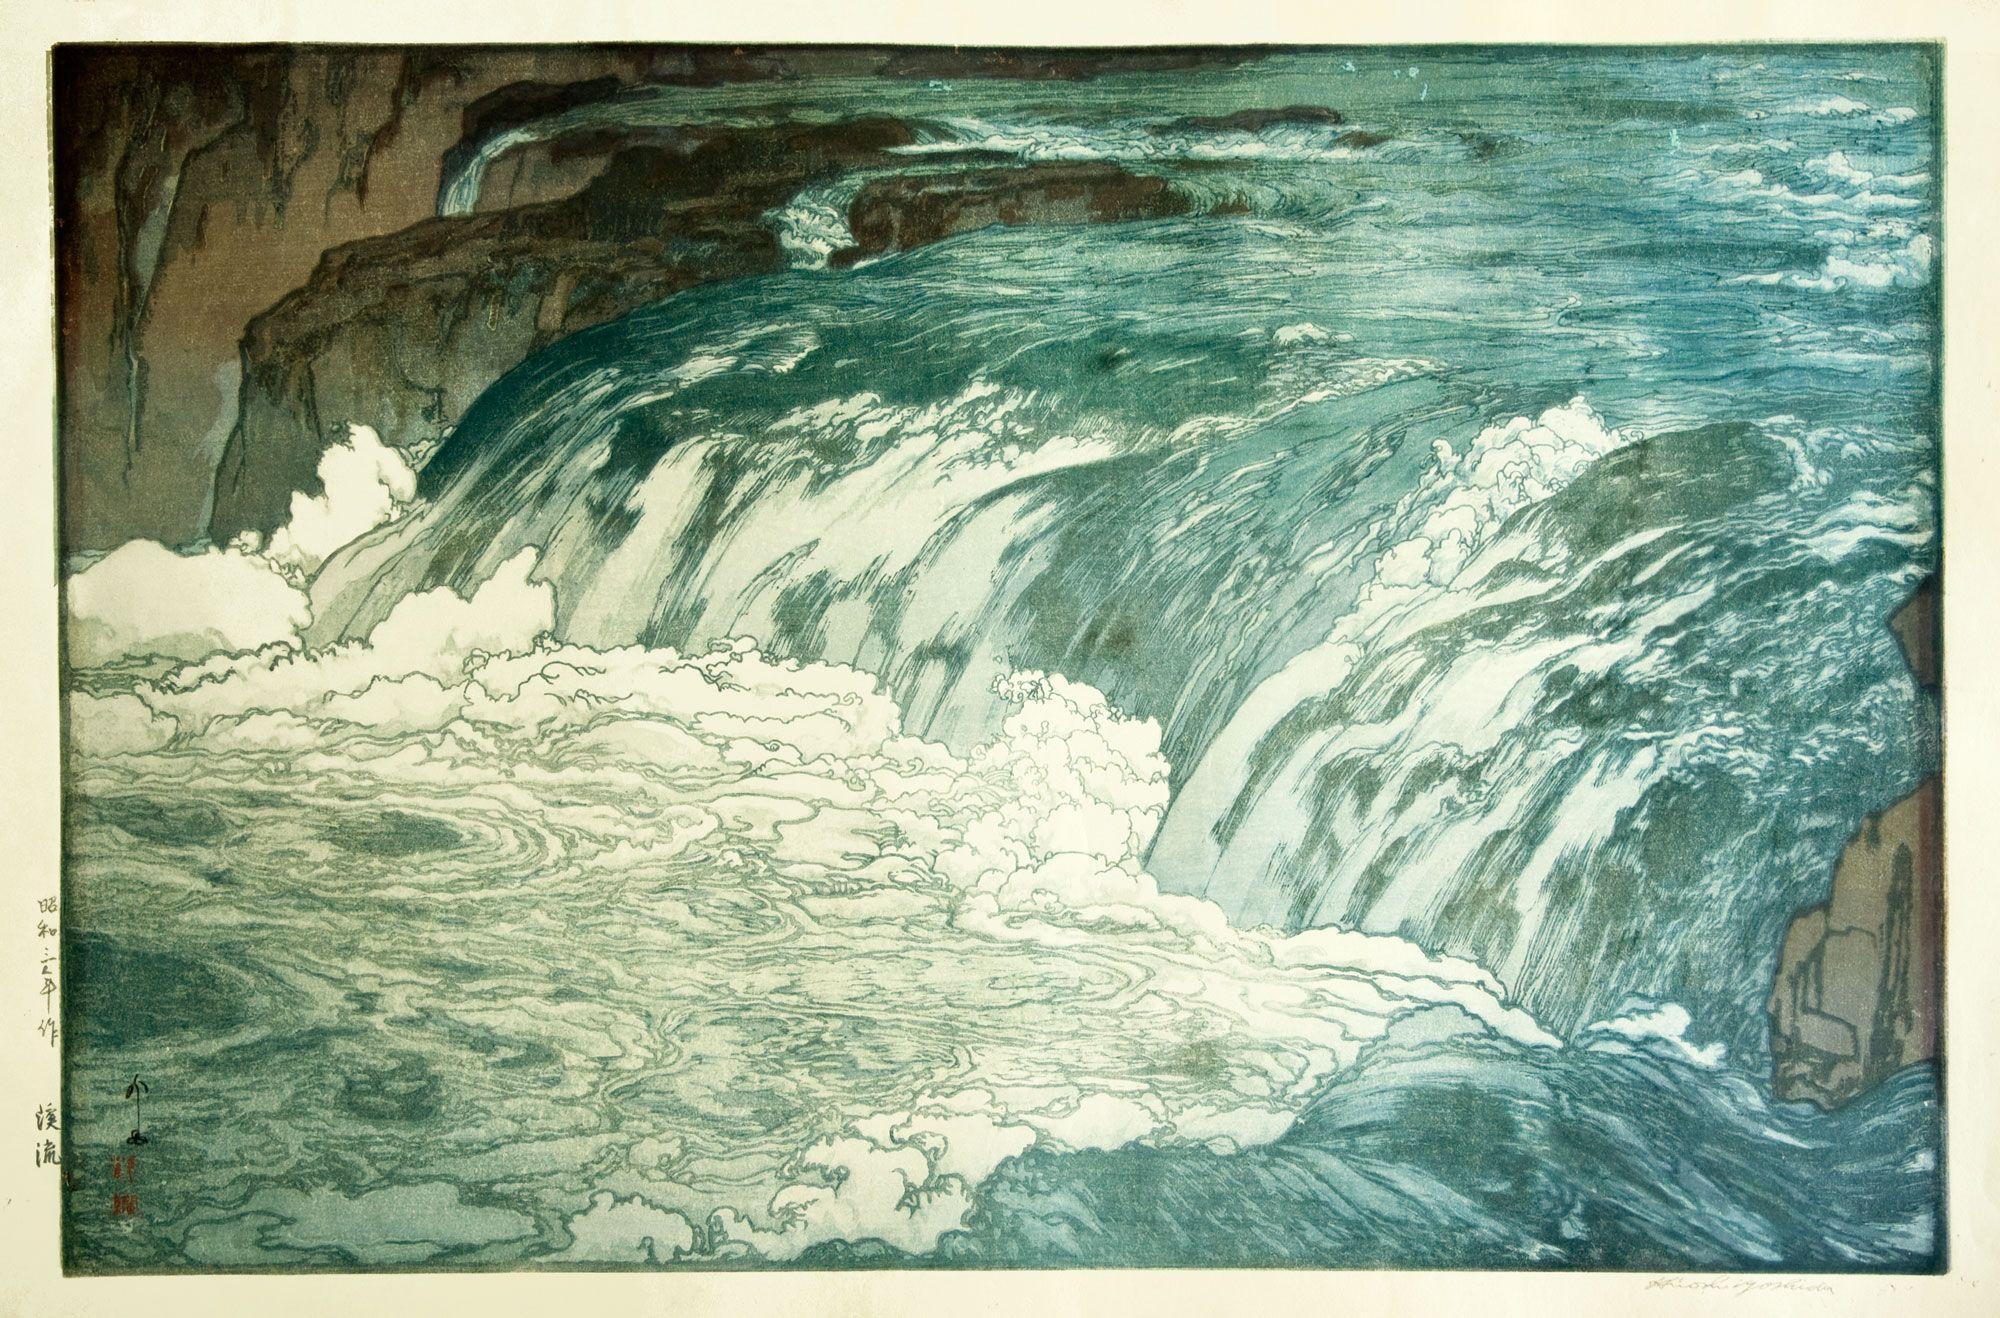 Hiroshi Yoshida.  This piece amazes me.